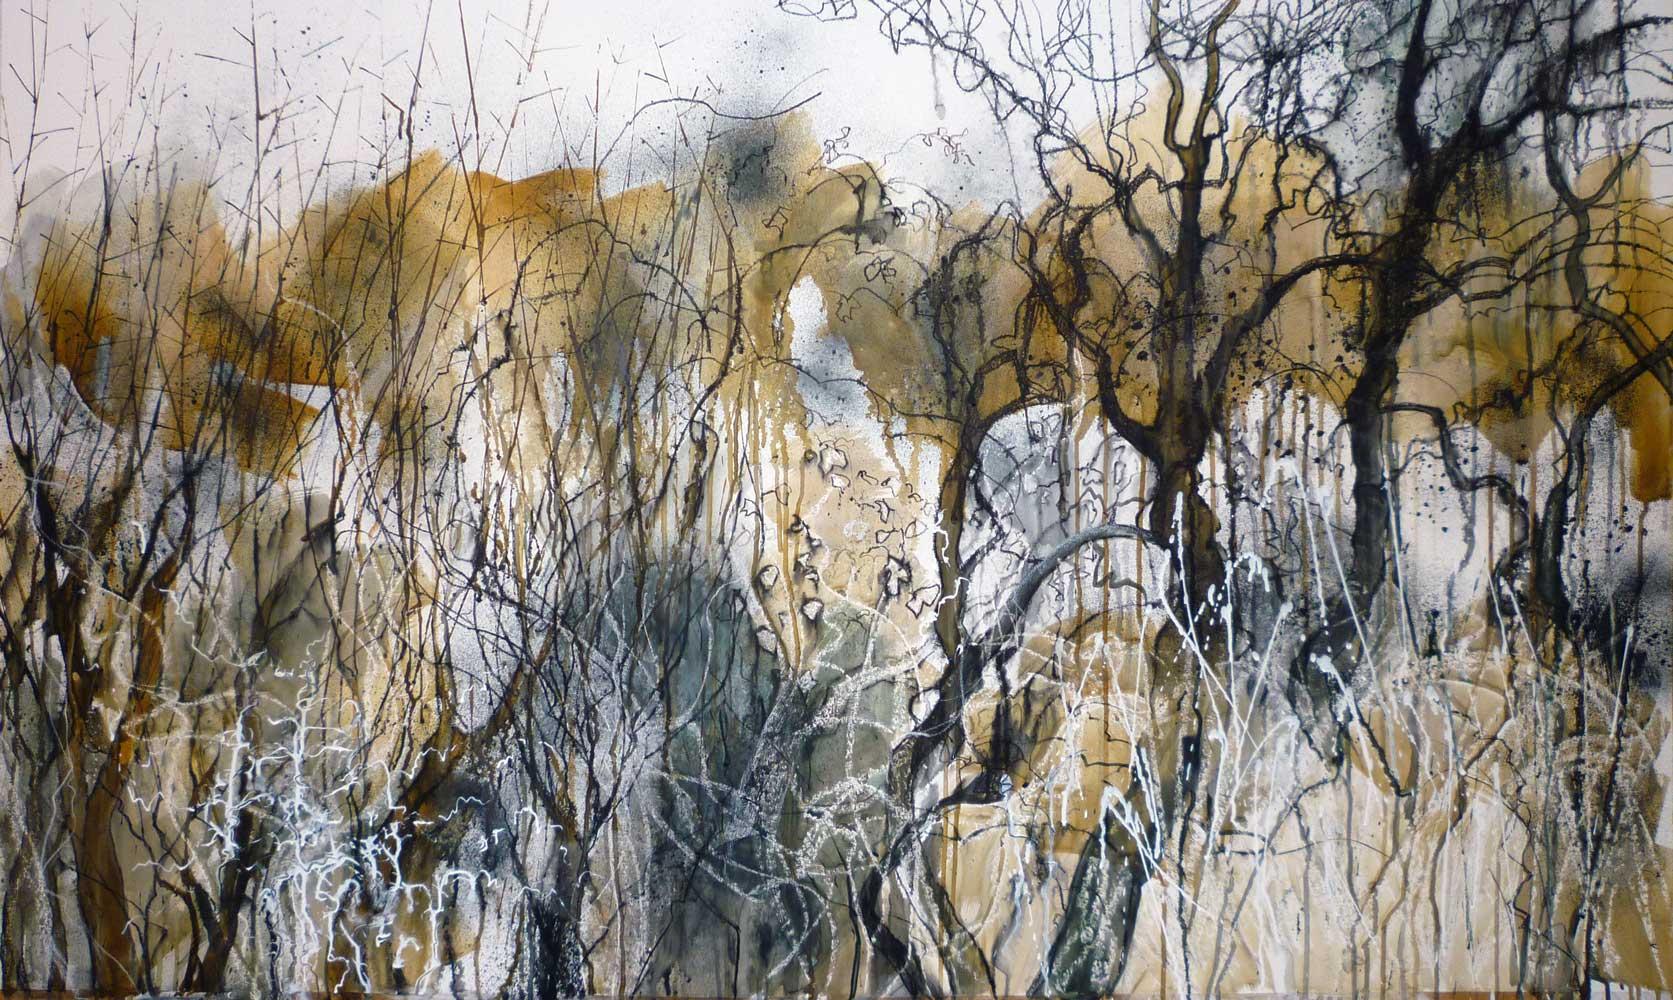 Winter hedgerow 5